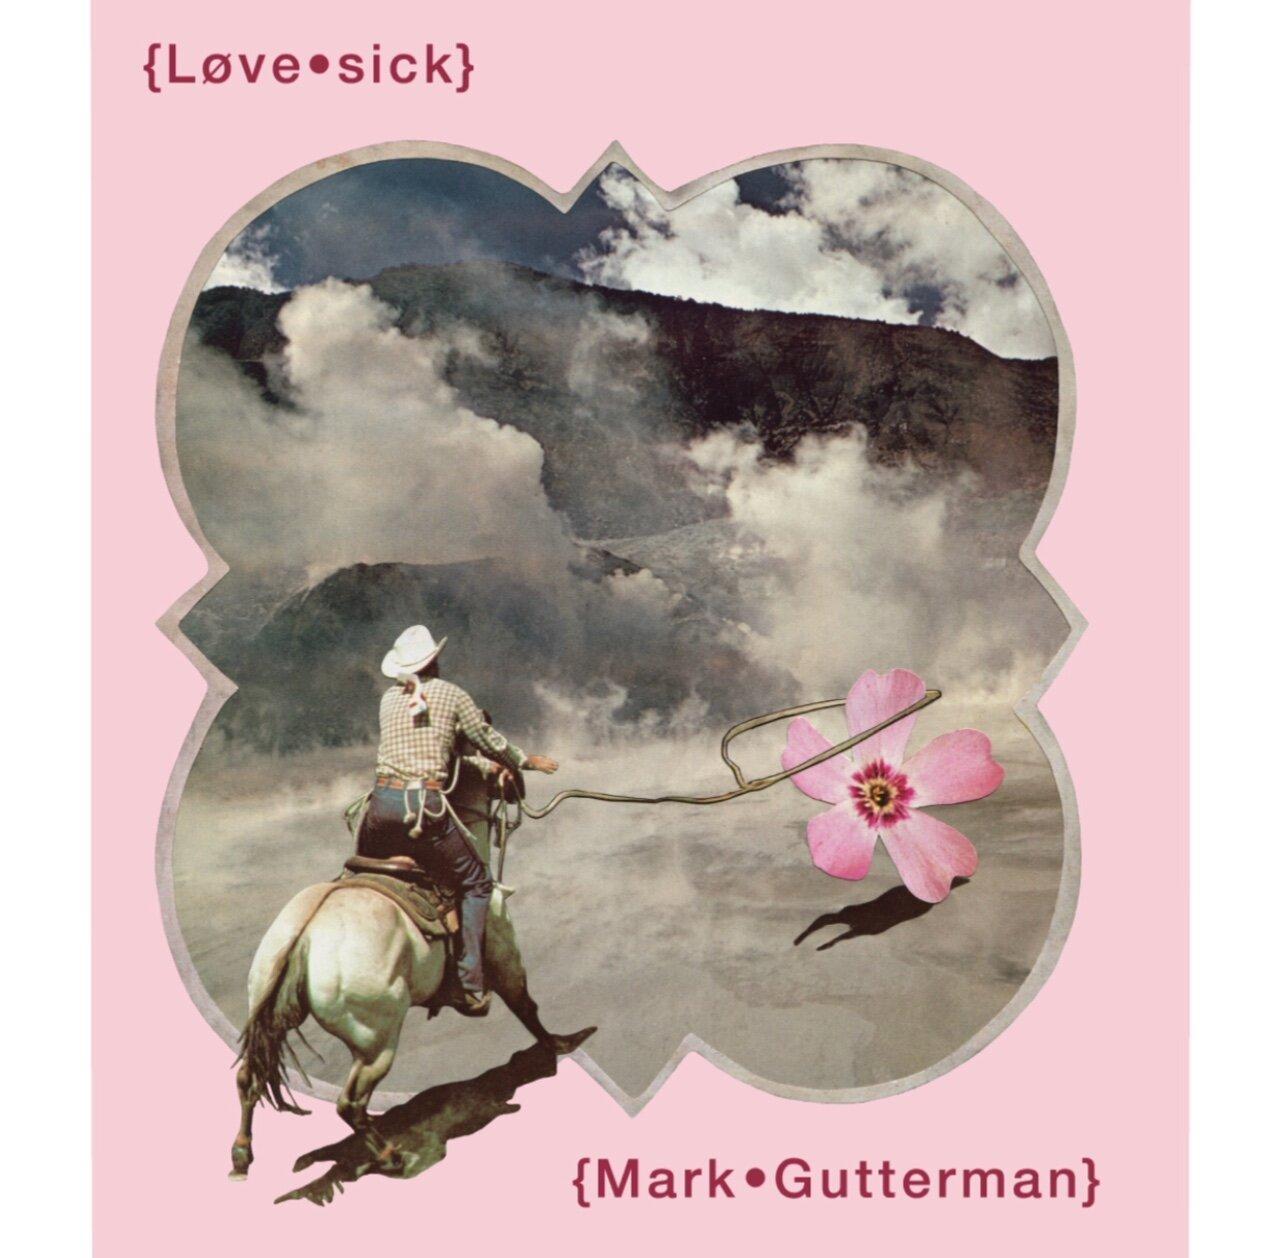 @lovesickskateboards  / Collage work by Jay Riggio for Mark Gutterman